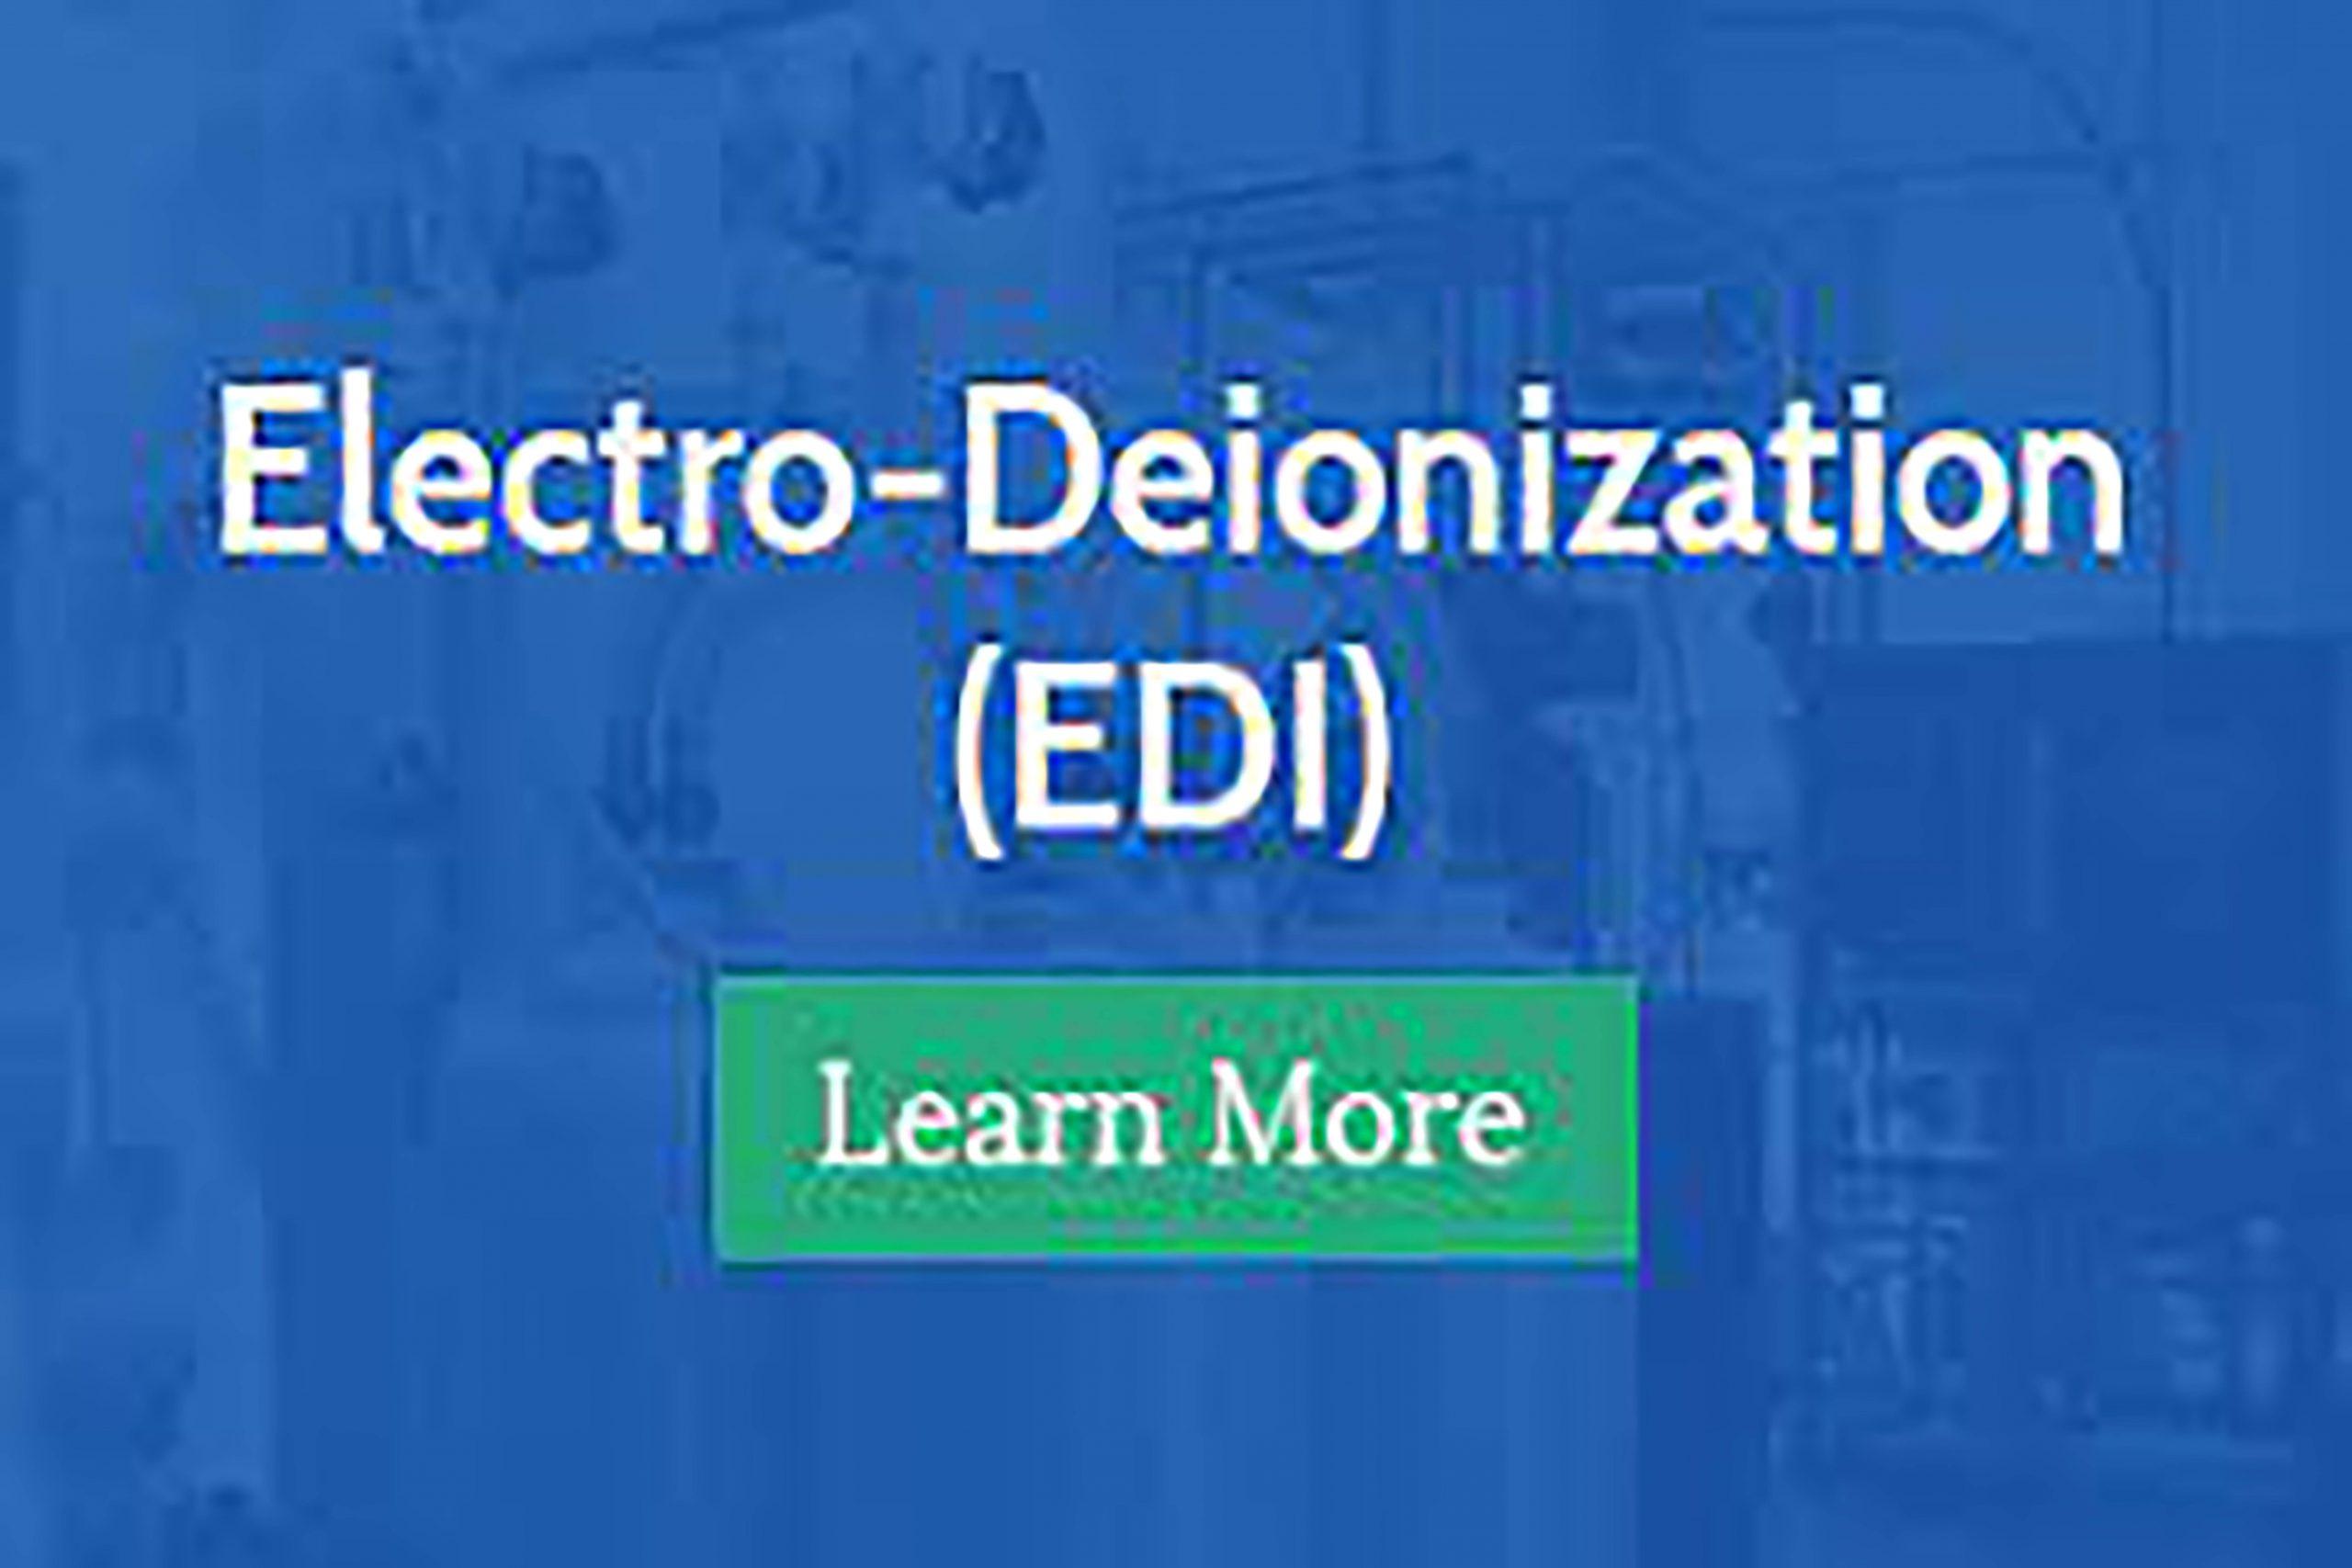 H2O Solutions Electro-Deionization (EDI)